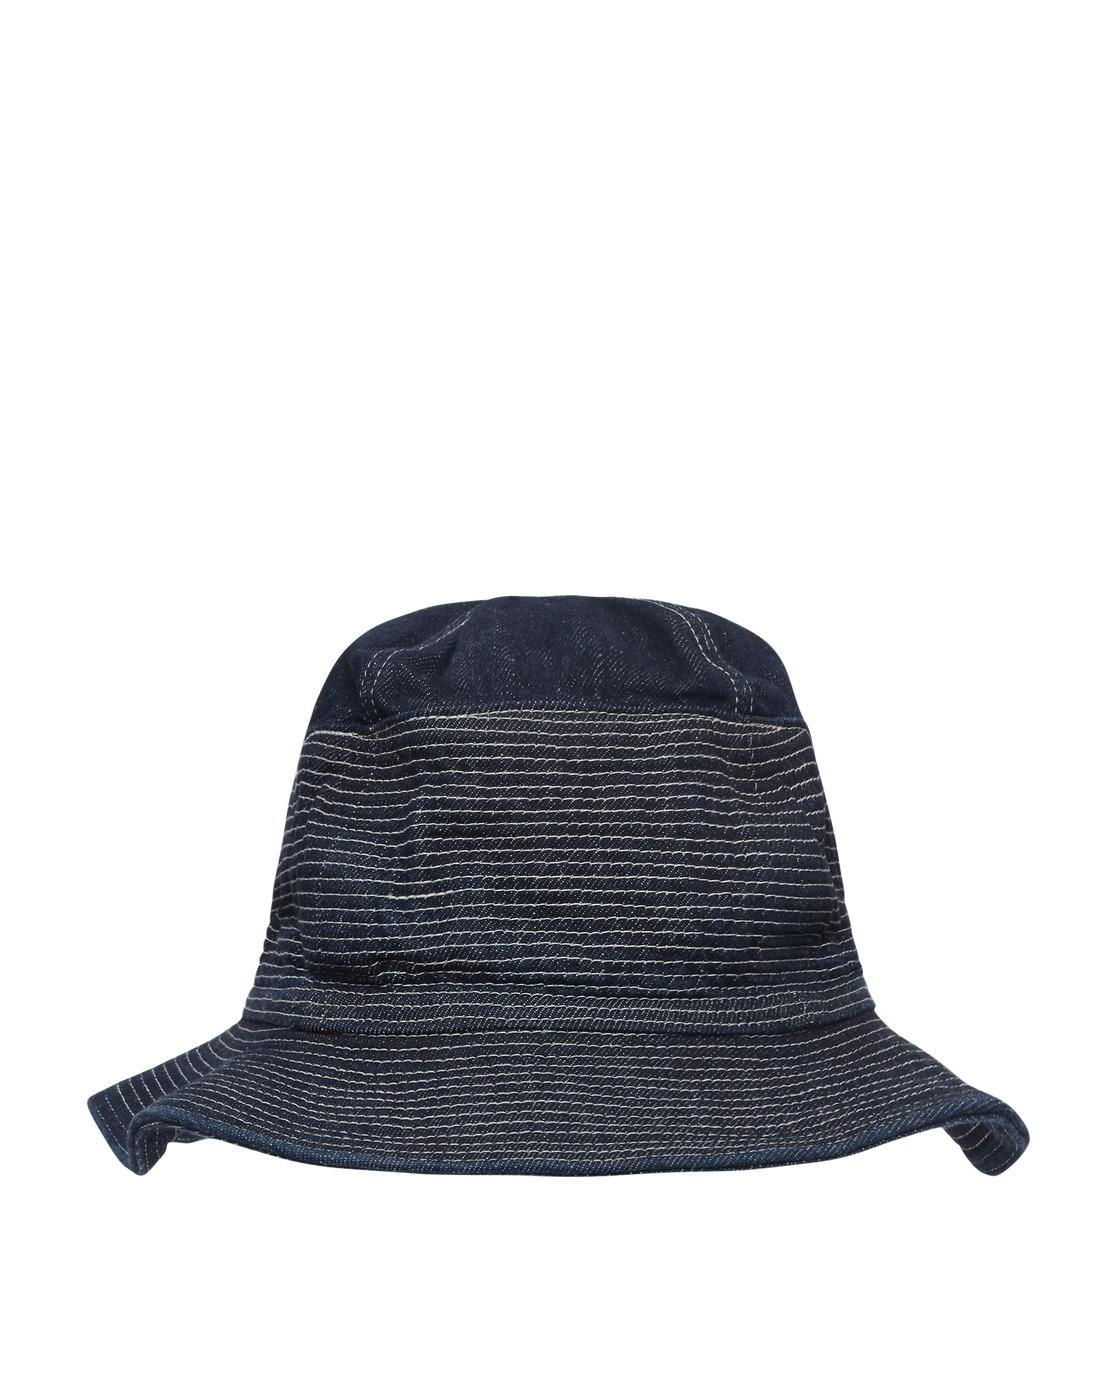 Kapital 12oz Denim The Old Man And The Sea Bucket Hat Dark